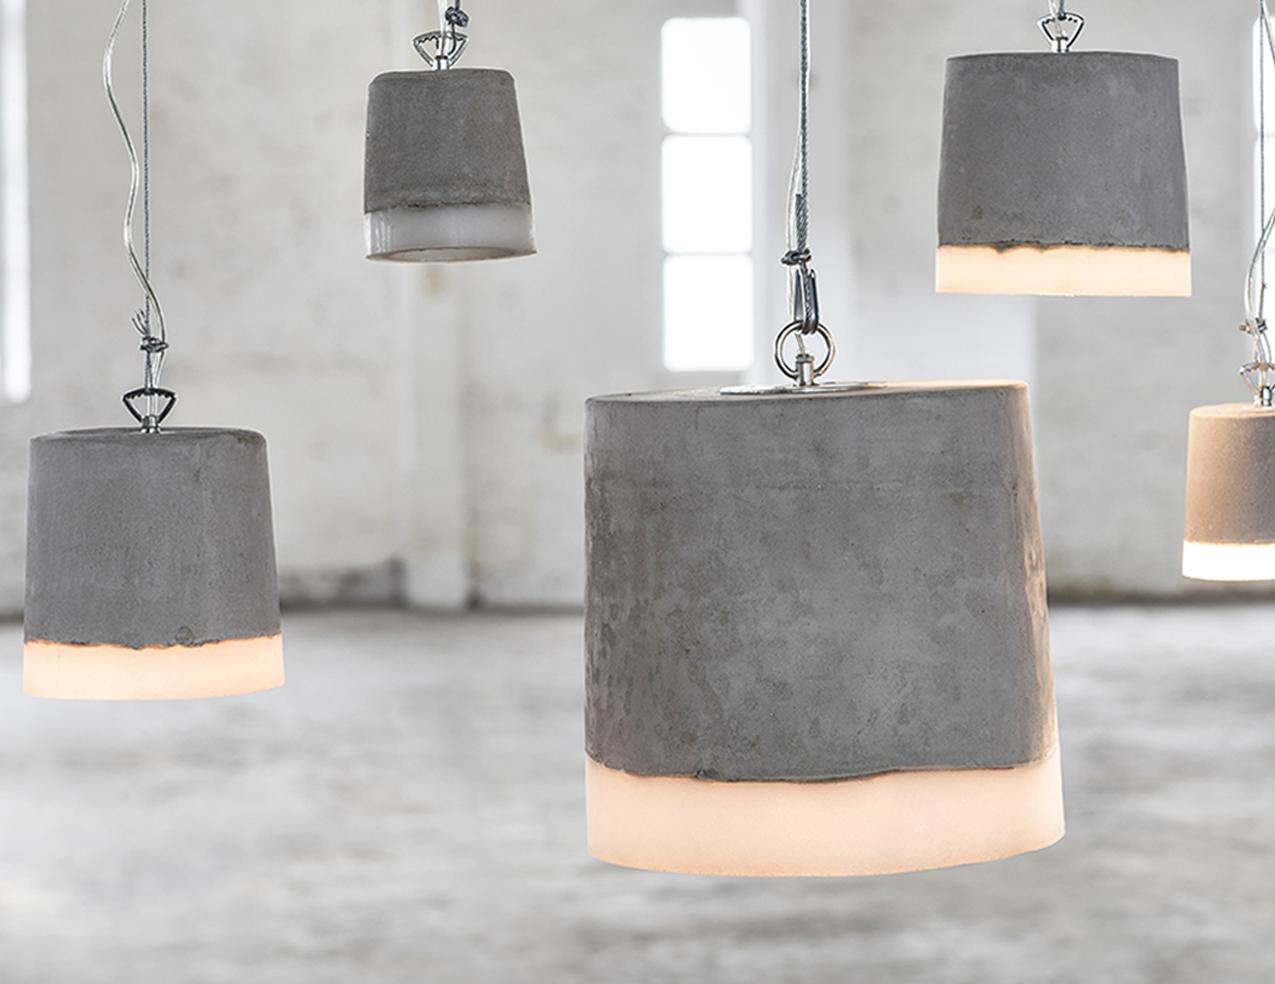 Renate-Vos-concrete-pendant-productpagin